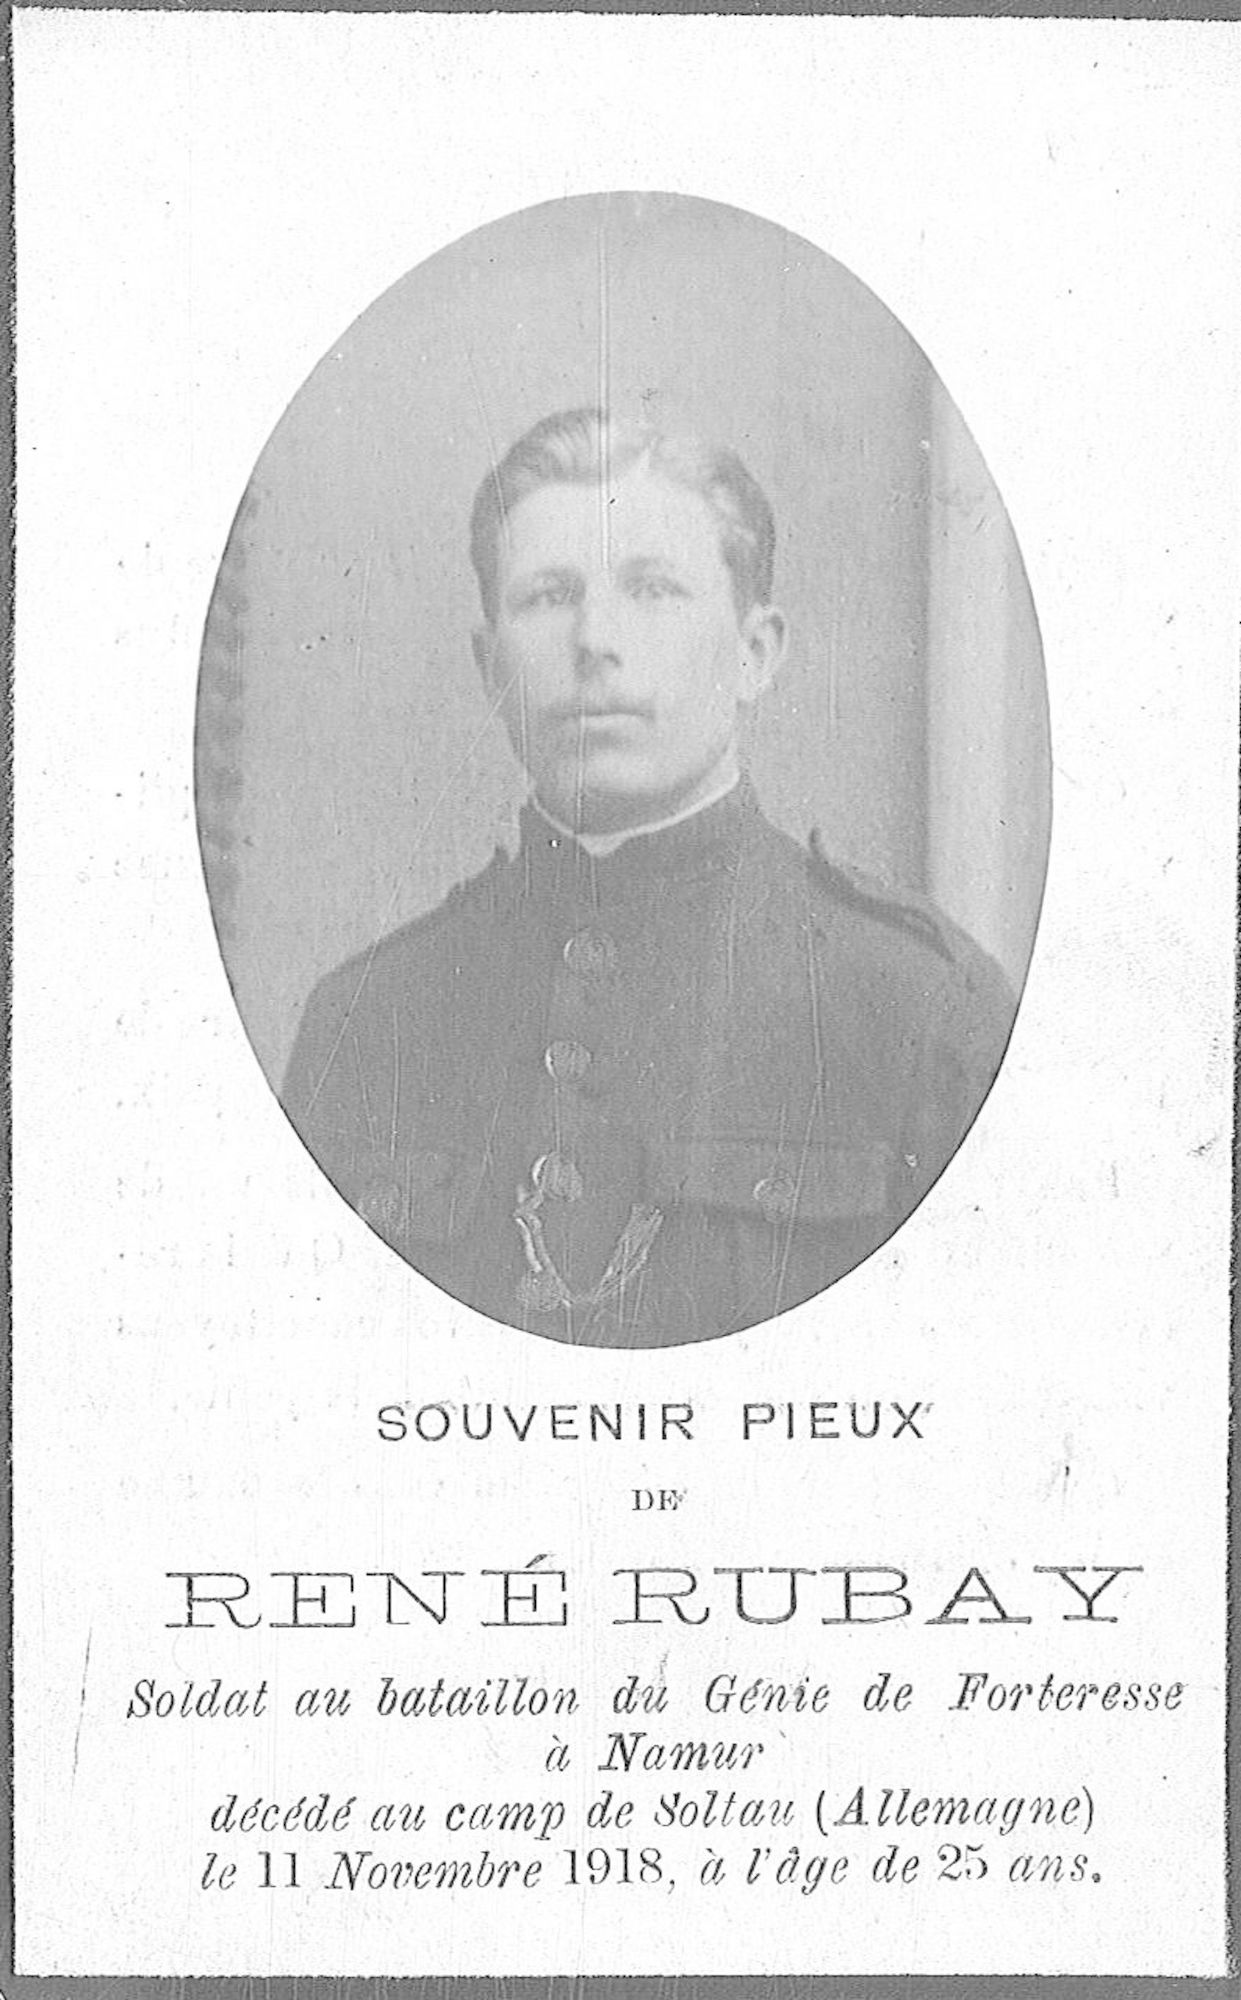 René Rubay